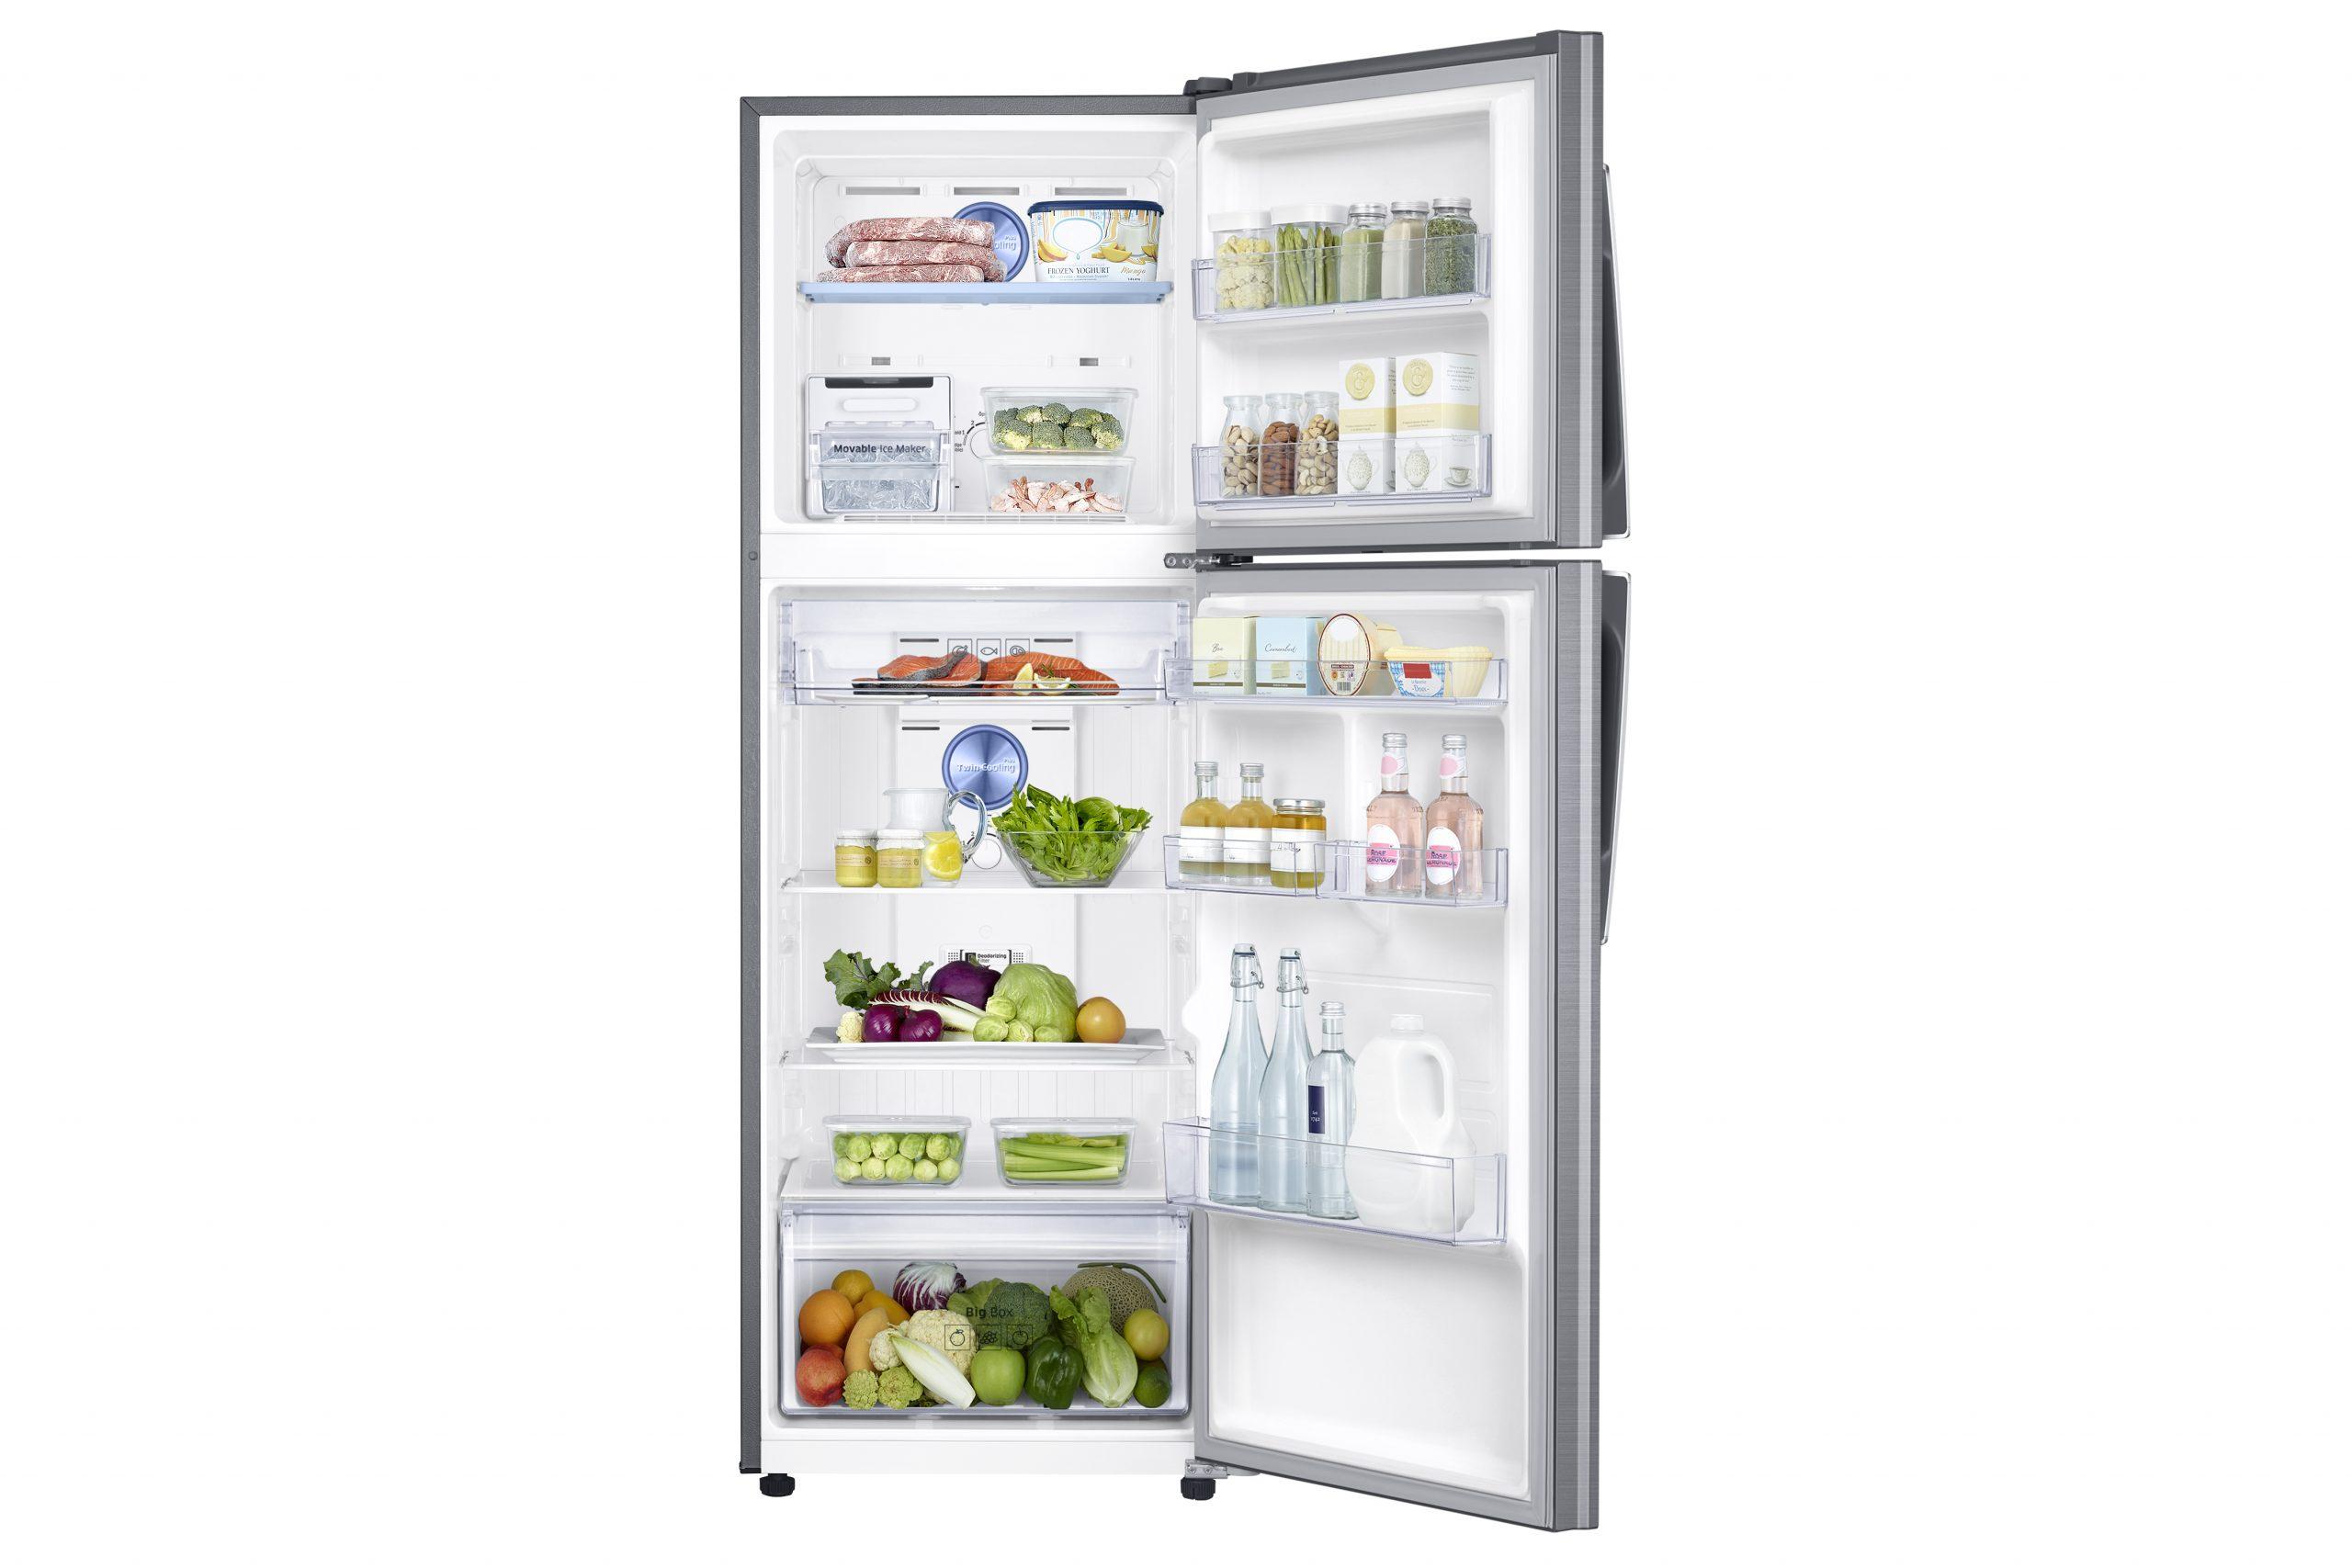 Холодильник Samsung RT32K5132S8/WT  - 2